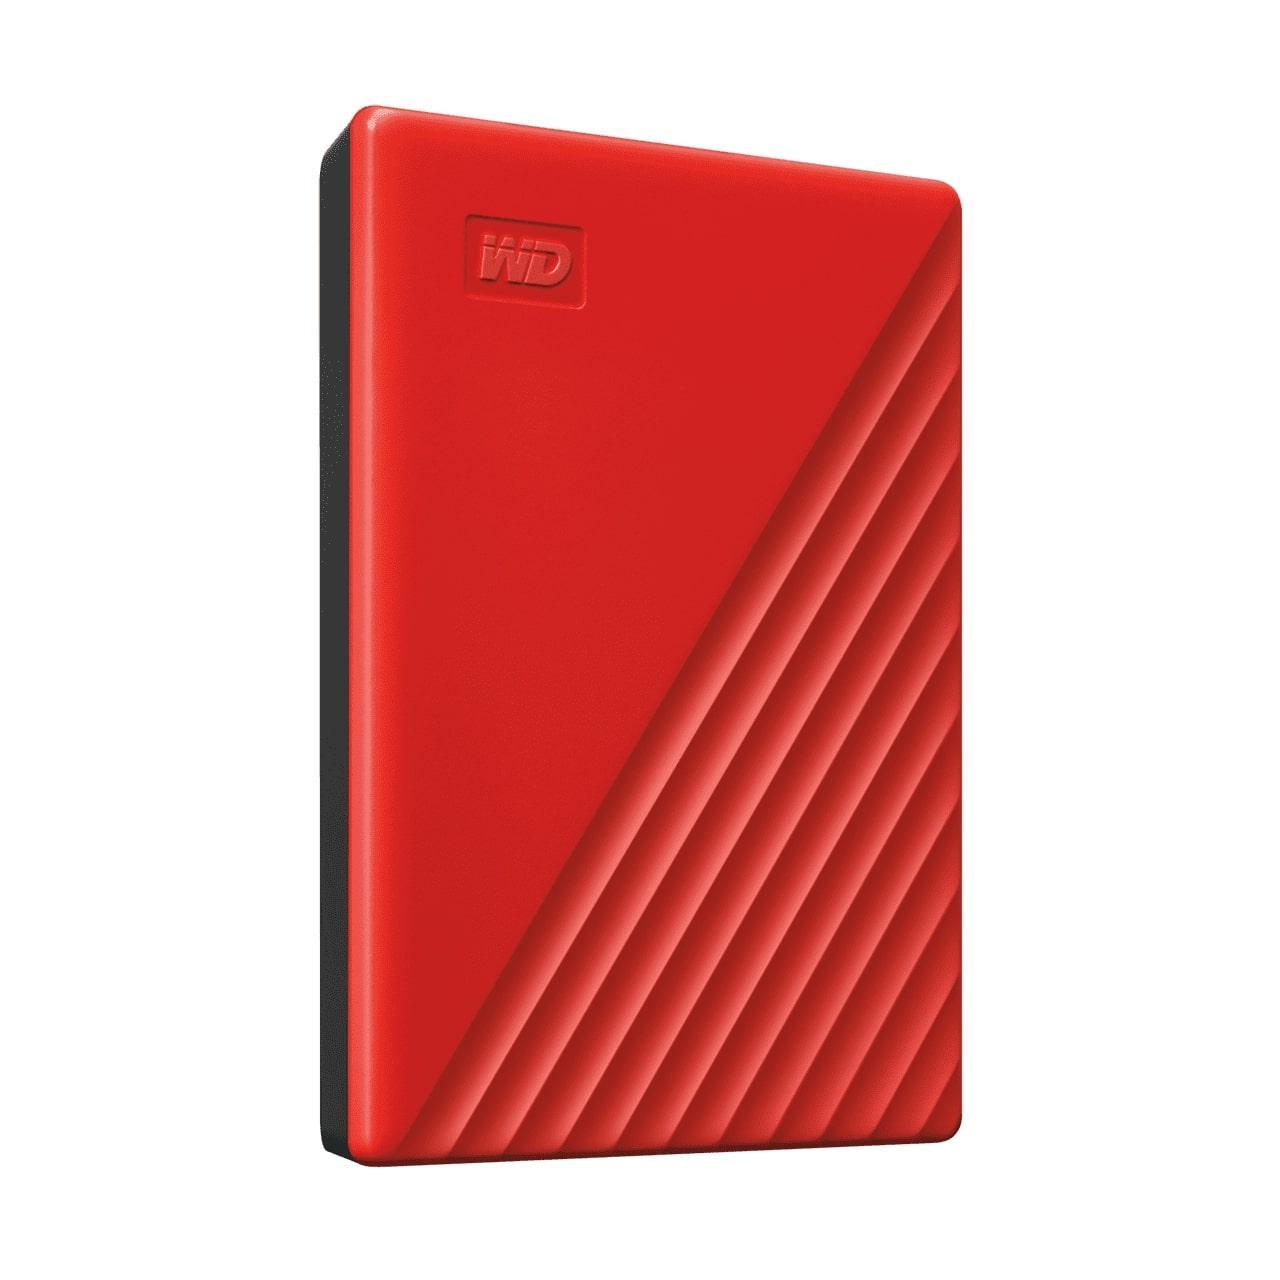 Зовнішній диск HDD External 2.5'' 4TB Western Digital My Passport Red  USB 3.2 (WDBPKJ0040BRD-WESN) (код